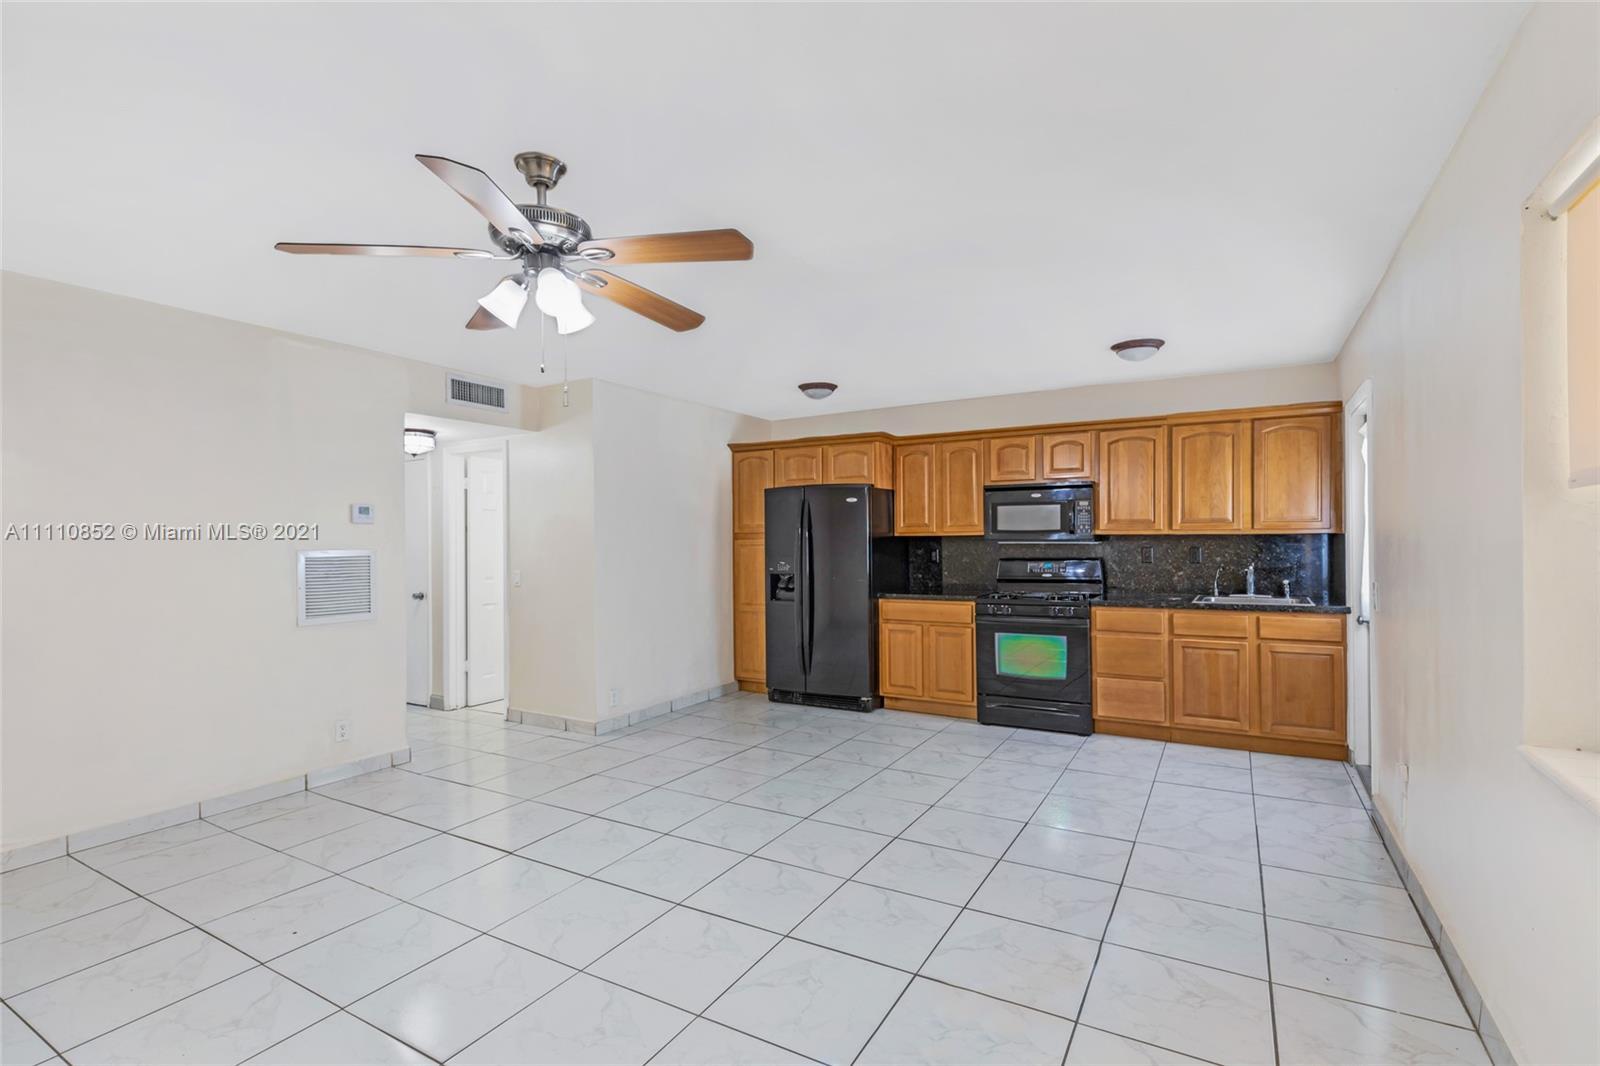 1765 Venice Ln #2E, North Miami, Florida 33181, 2 Bedrooms Bedrooms, ,1 BathroomBathrooms,Residential,For Sale,Venice Ln,A11110852